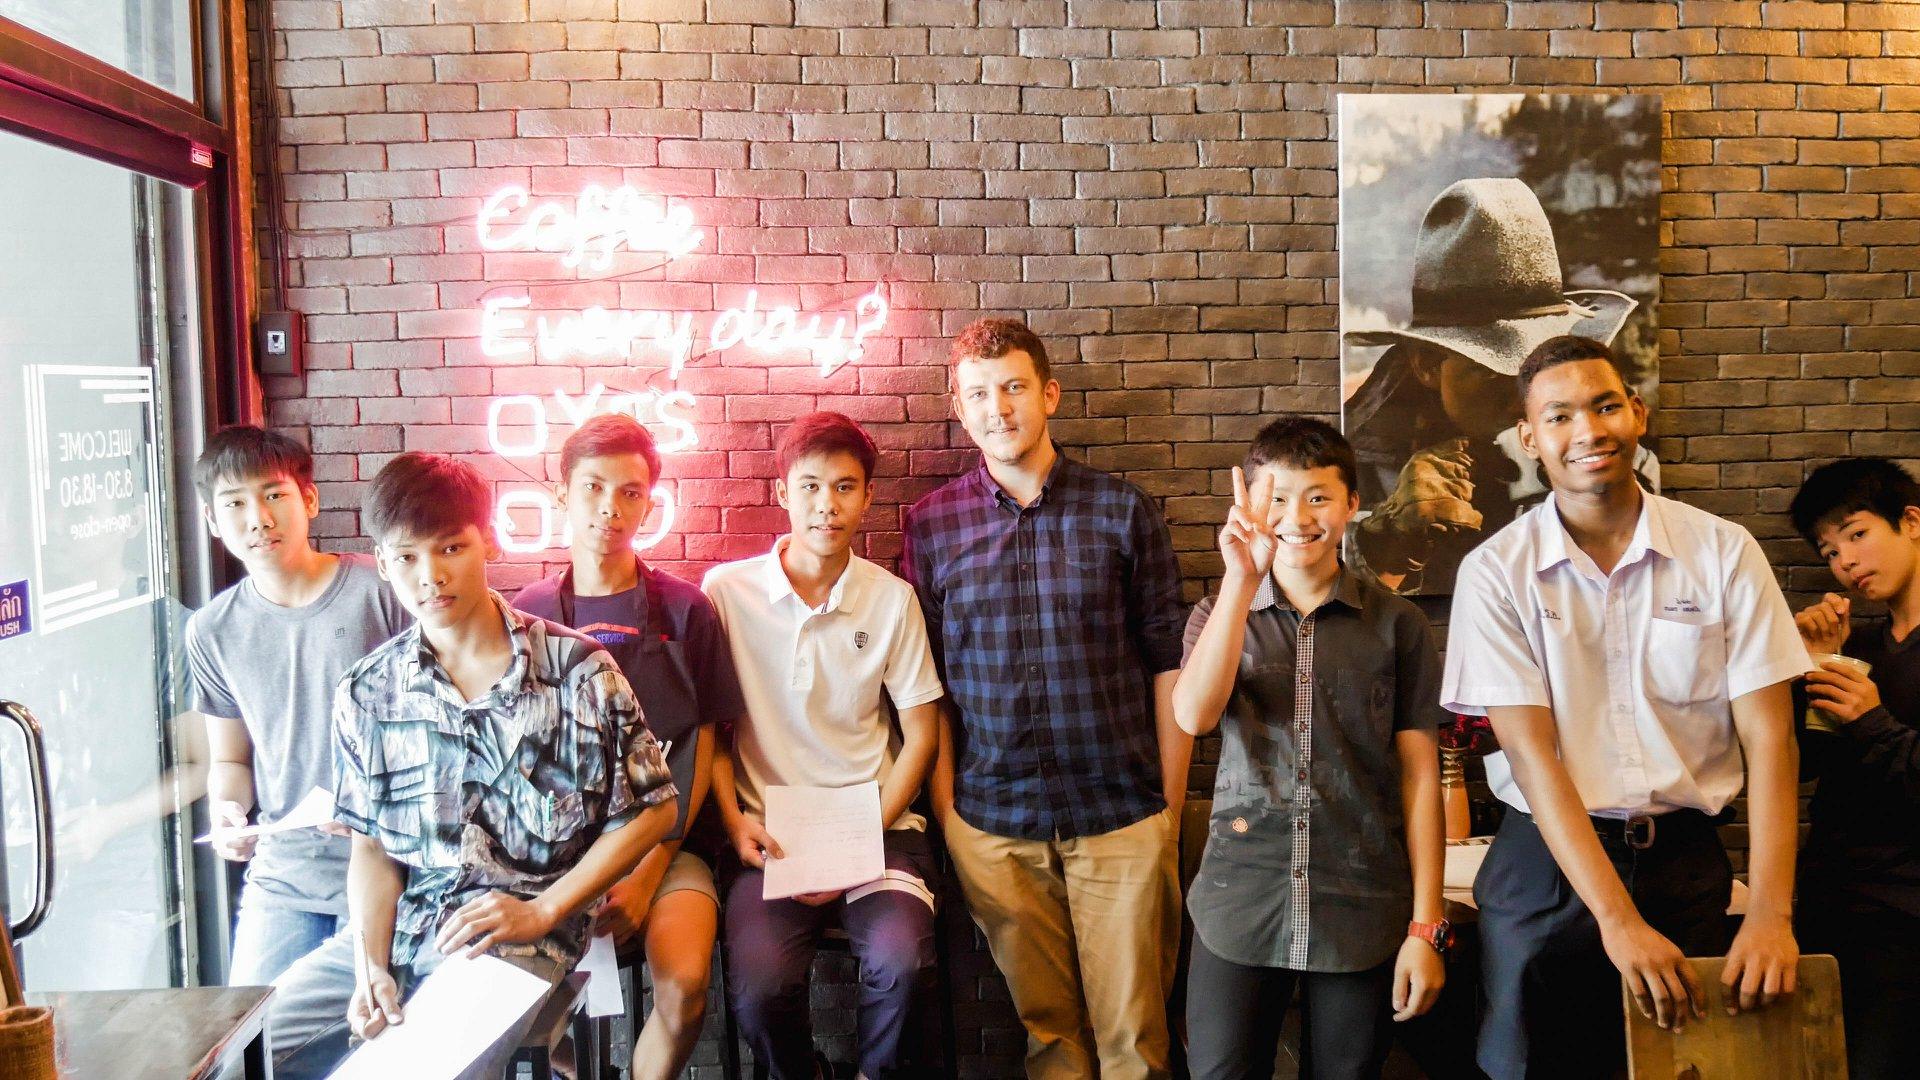 church youth group ideas